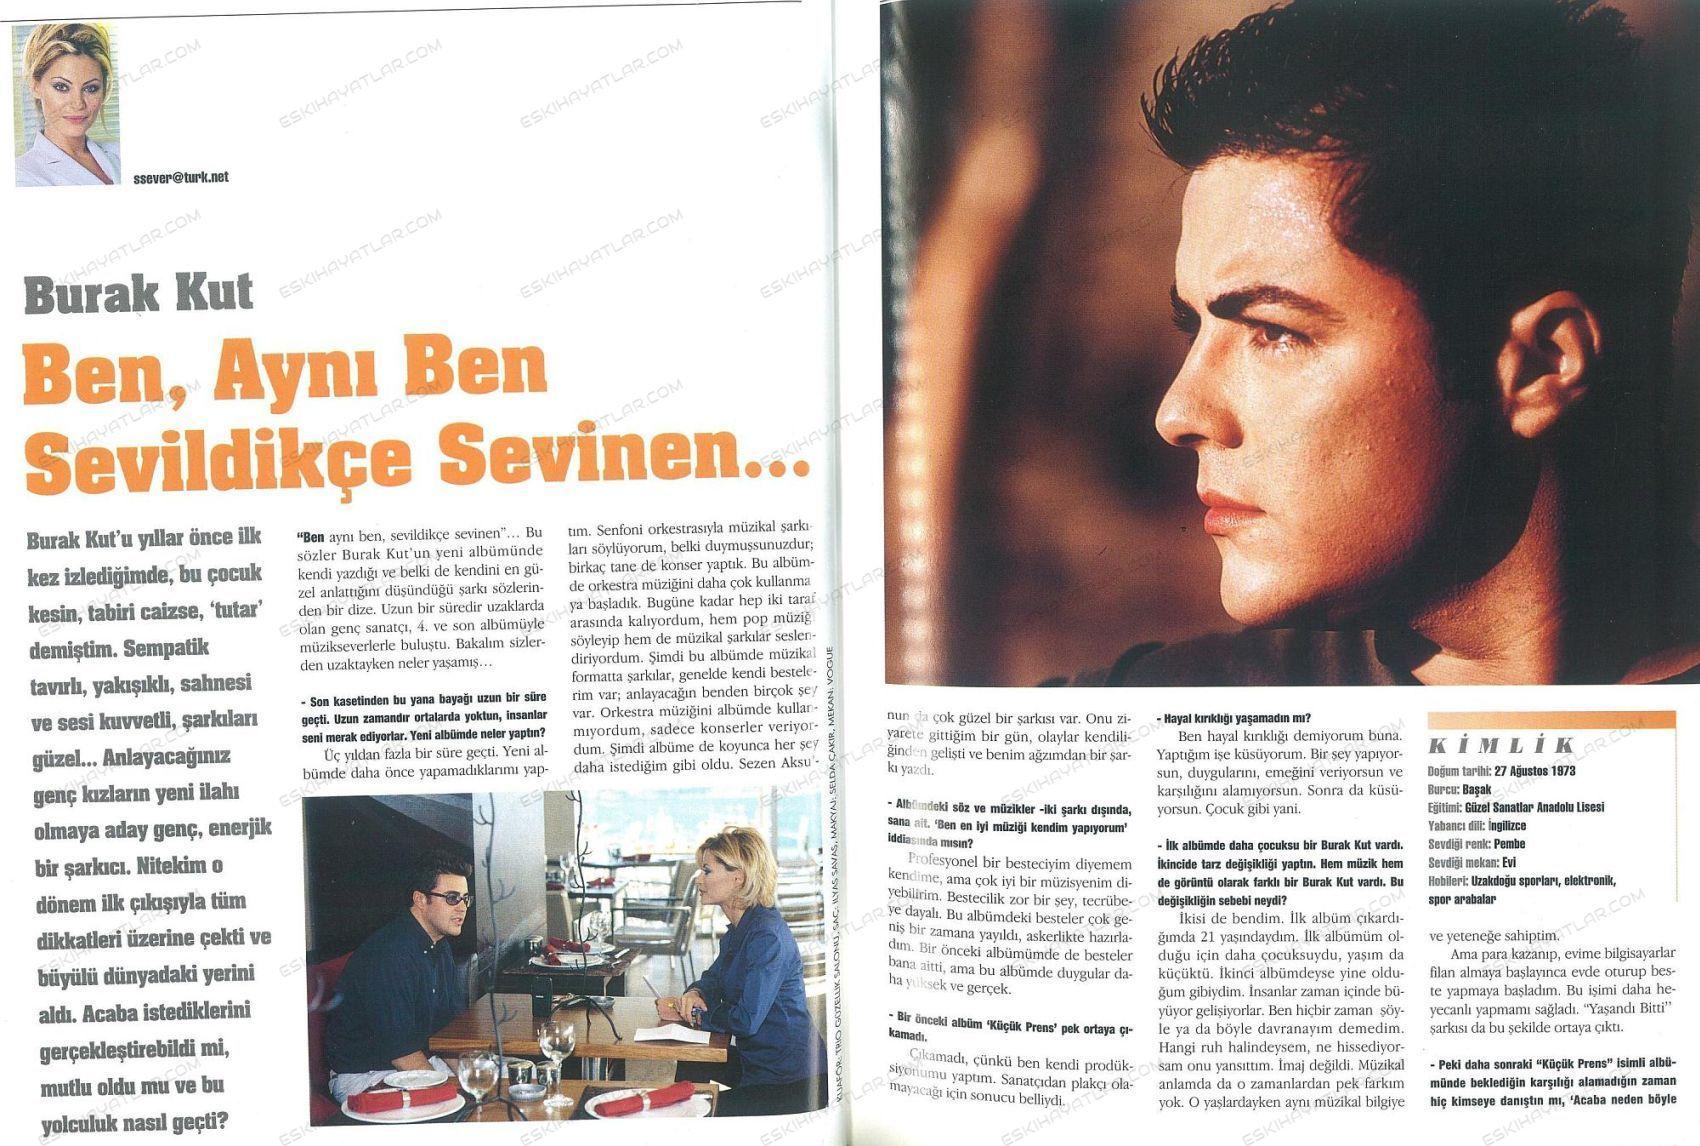 0220-burak-kut-roportaji-2000-yili-cosmopolitan-dergisi-seray-sever-nokia-3310-reklami (2)